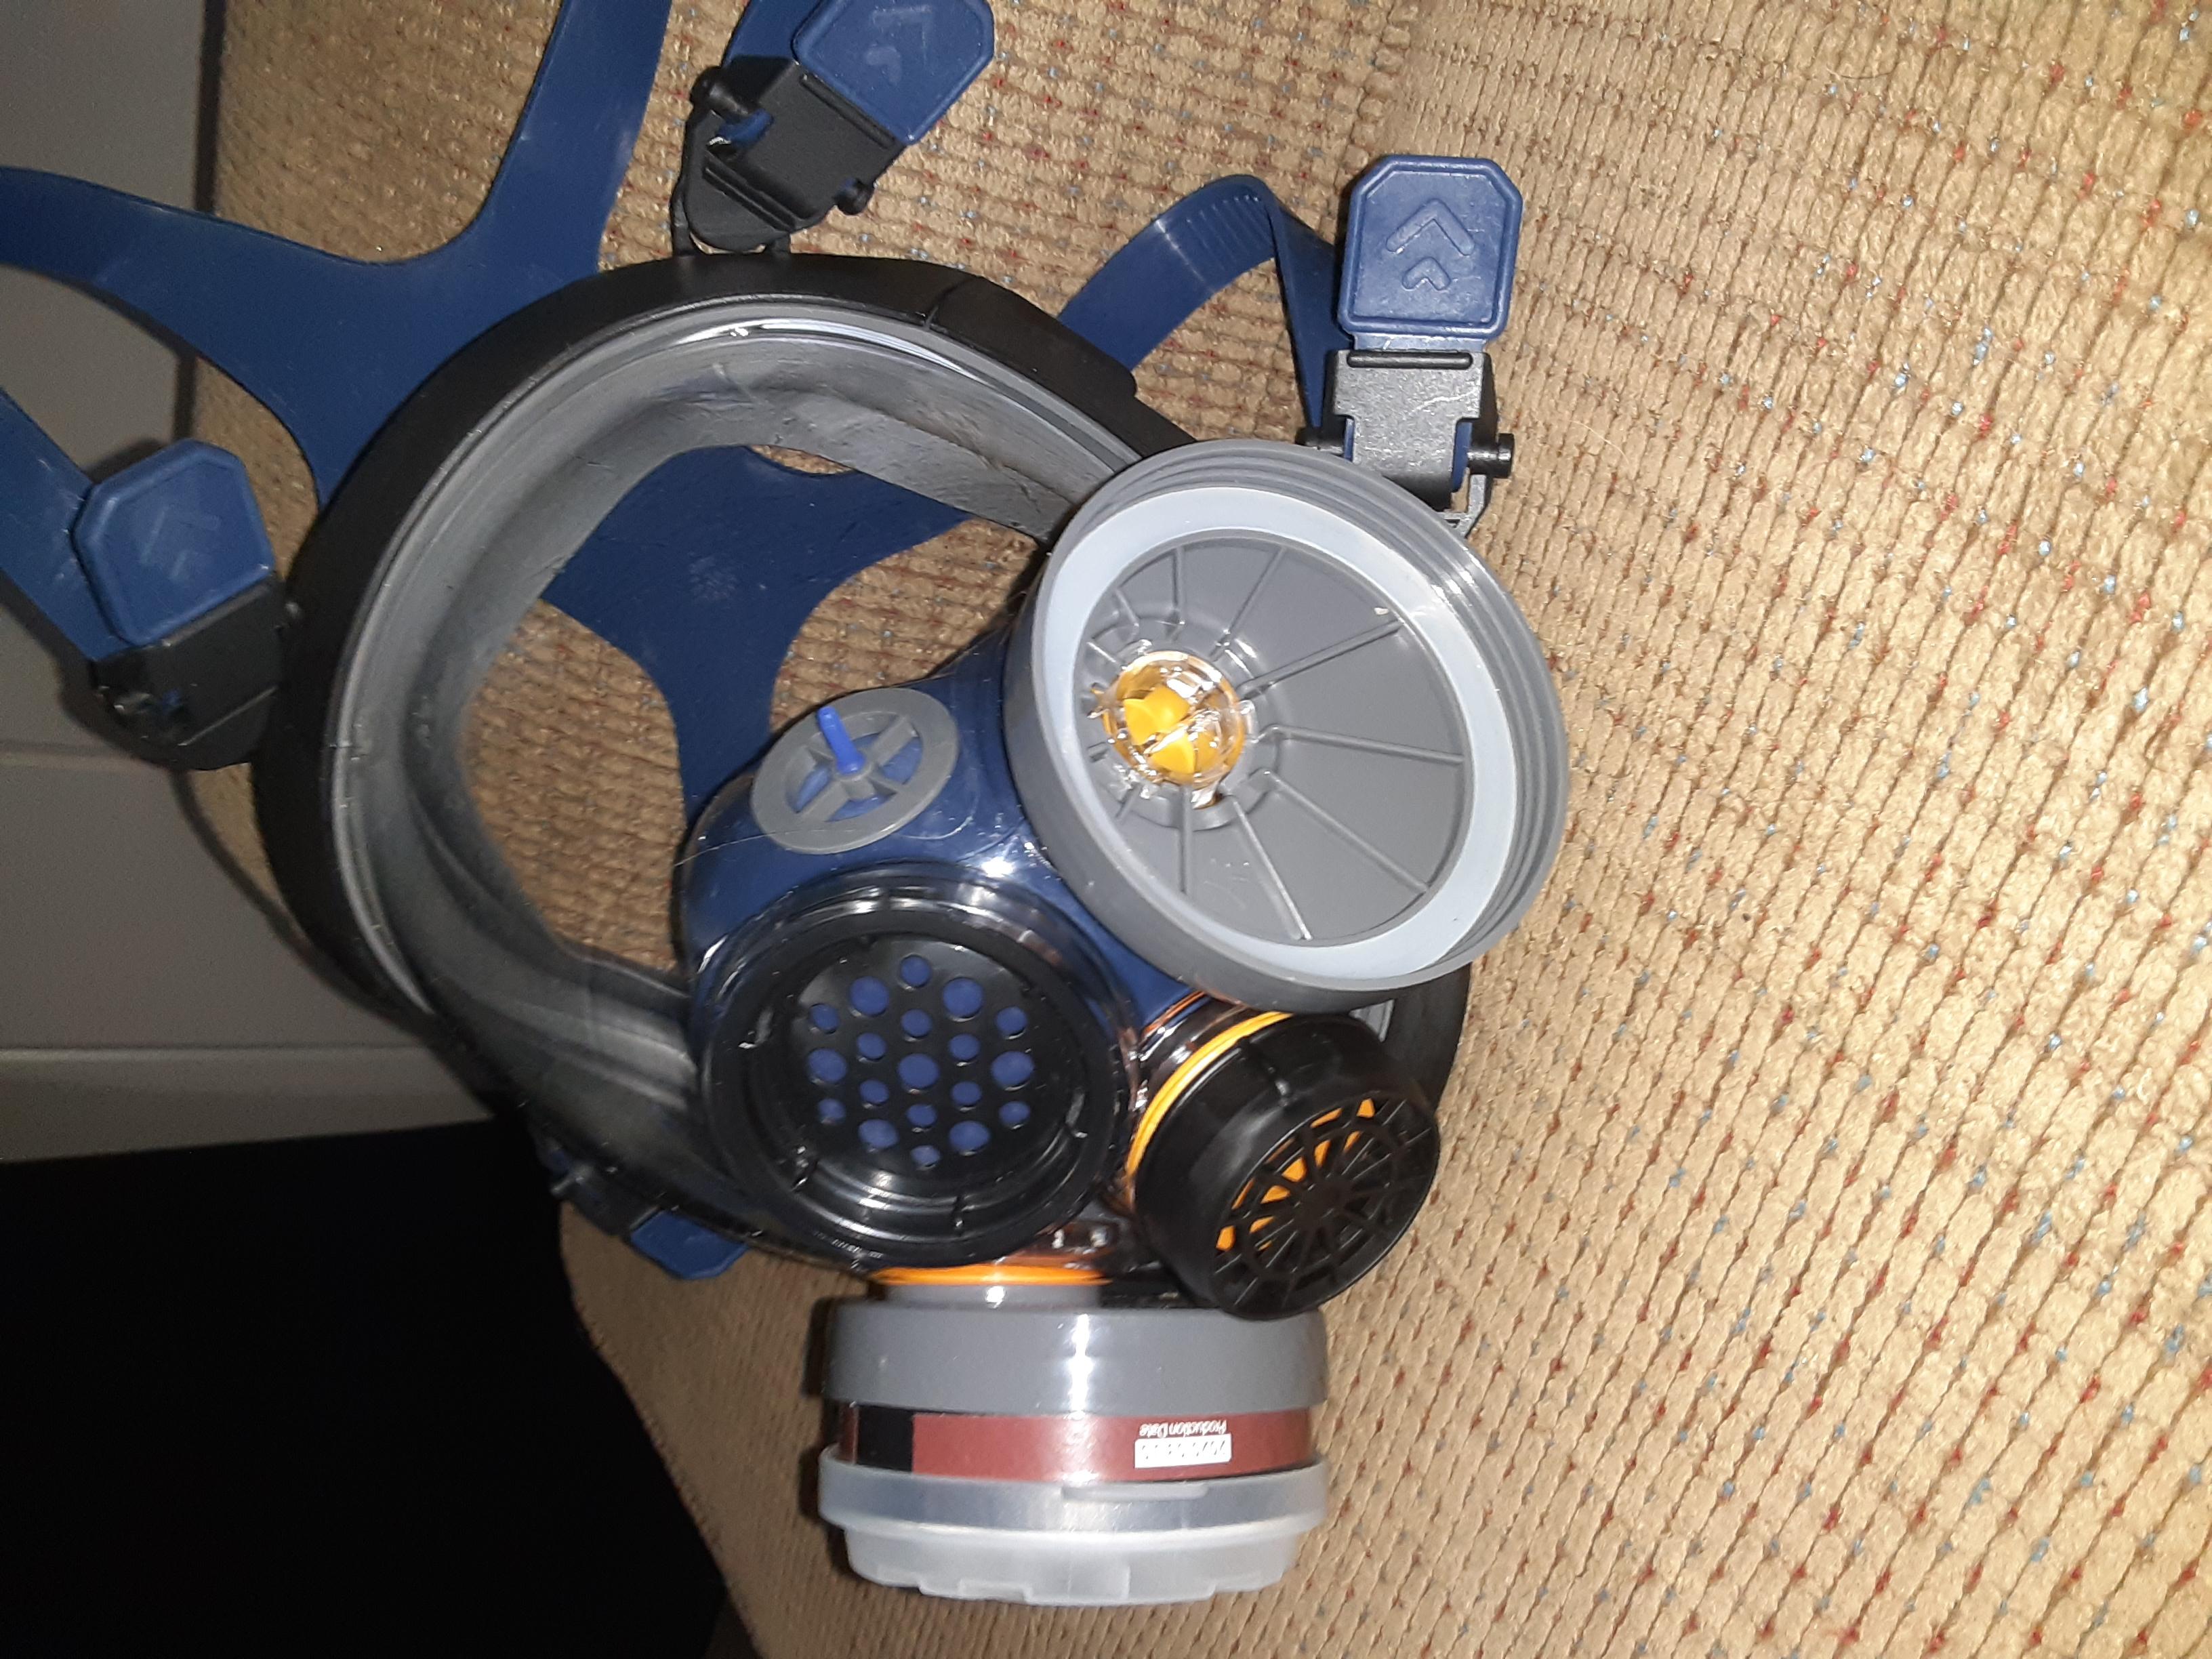 PD-100 full face respirator filter swap.-20200718_205620_1595120516512.jpg